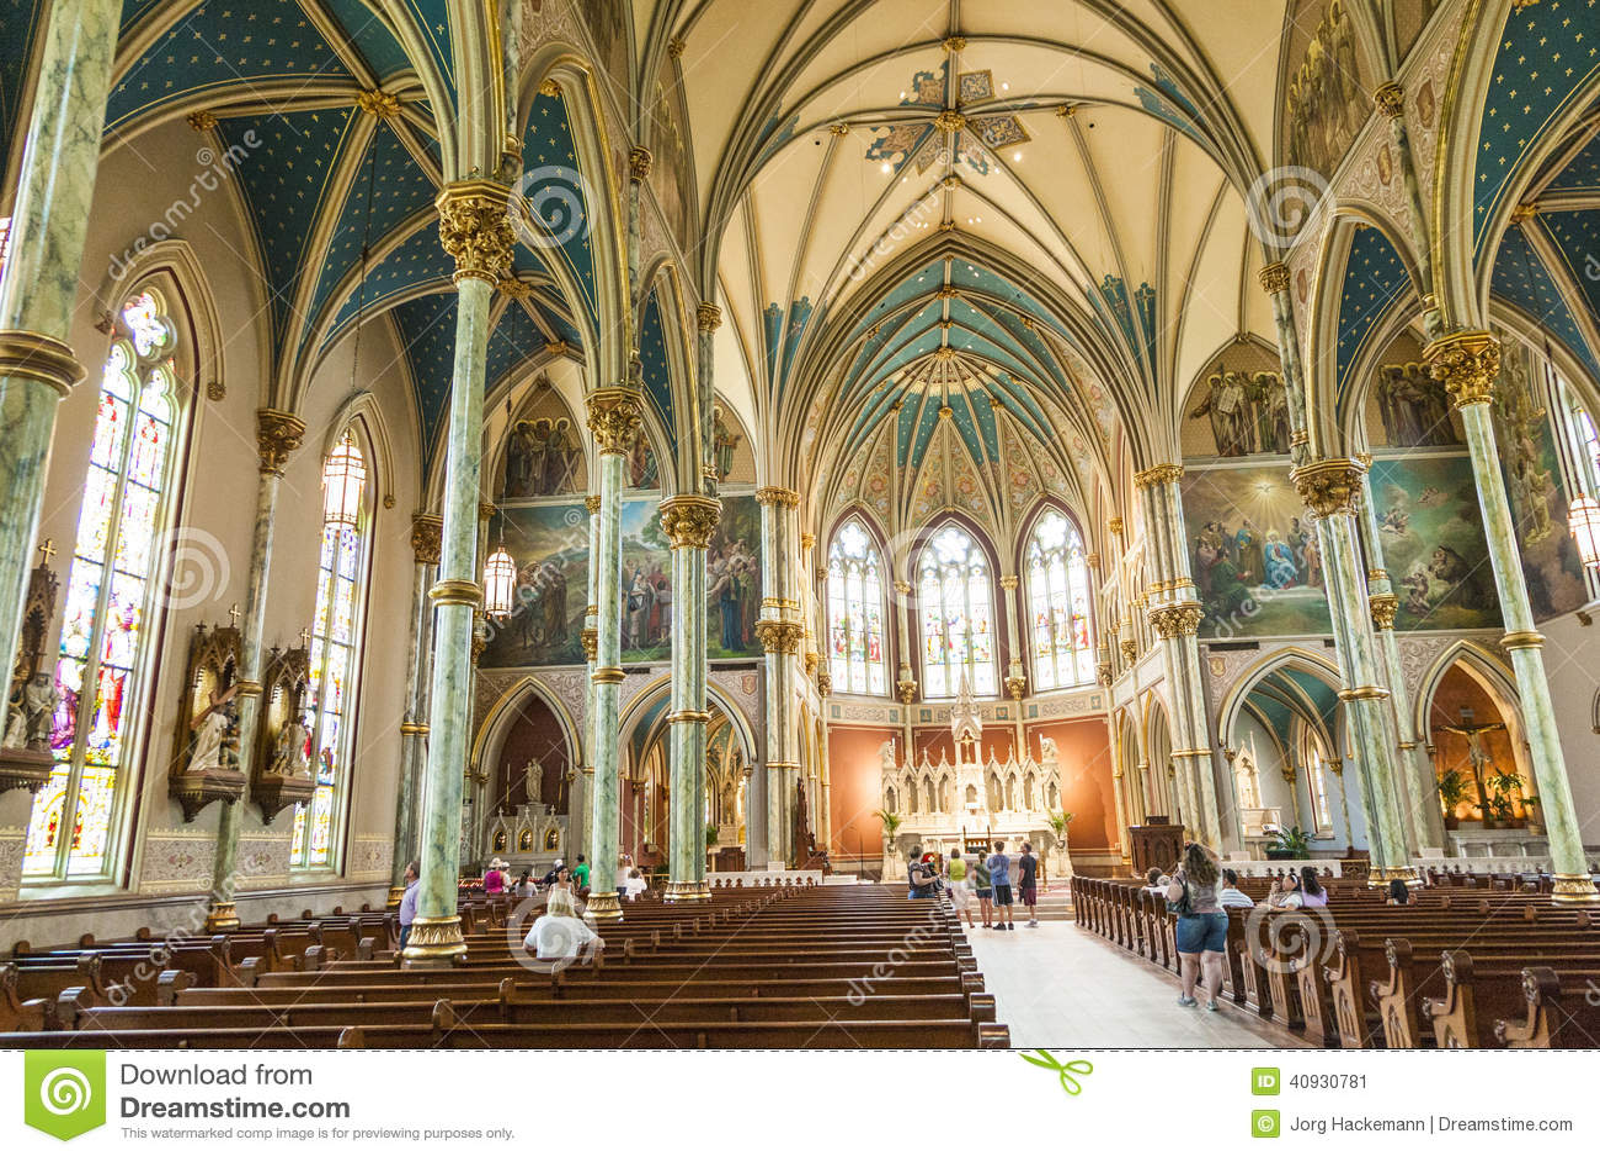 Nave Of St John The Baptist In Savannah Editorial Photo